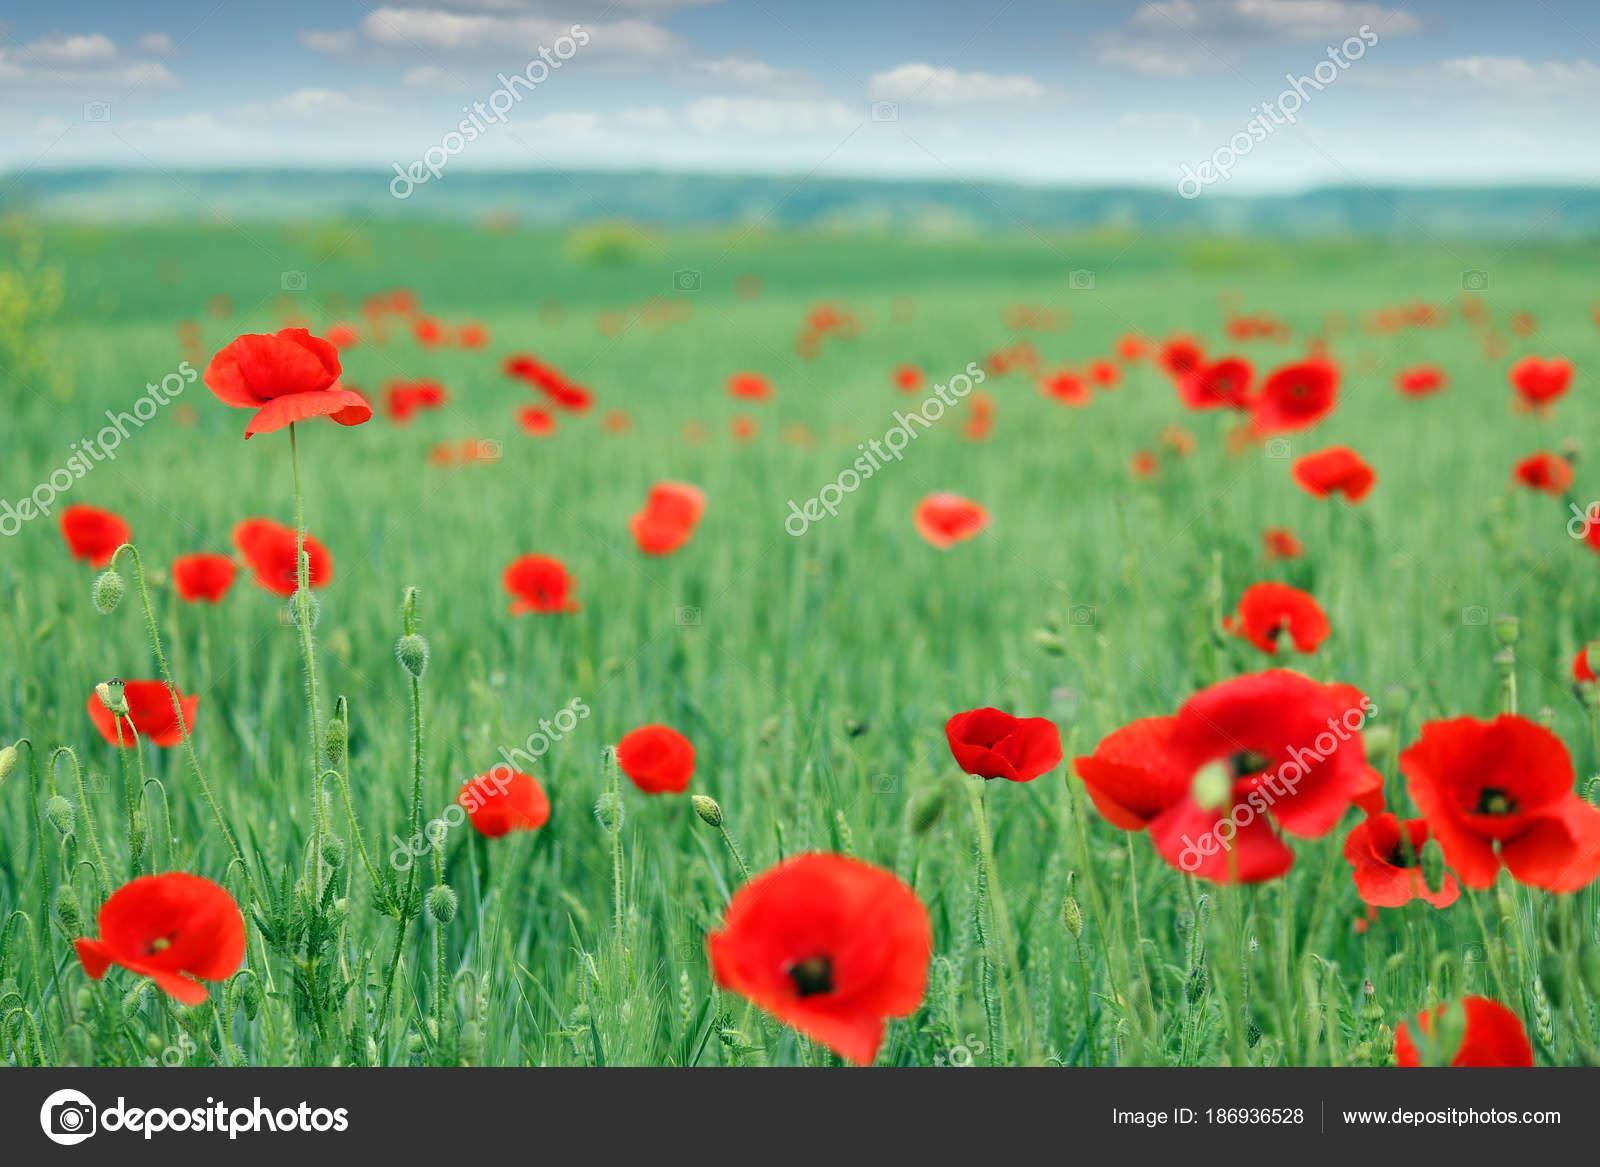 Poppies Flower Meadow Nature Landscape Stock Photo Goceristeski